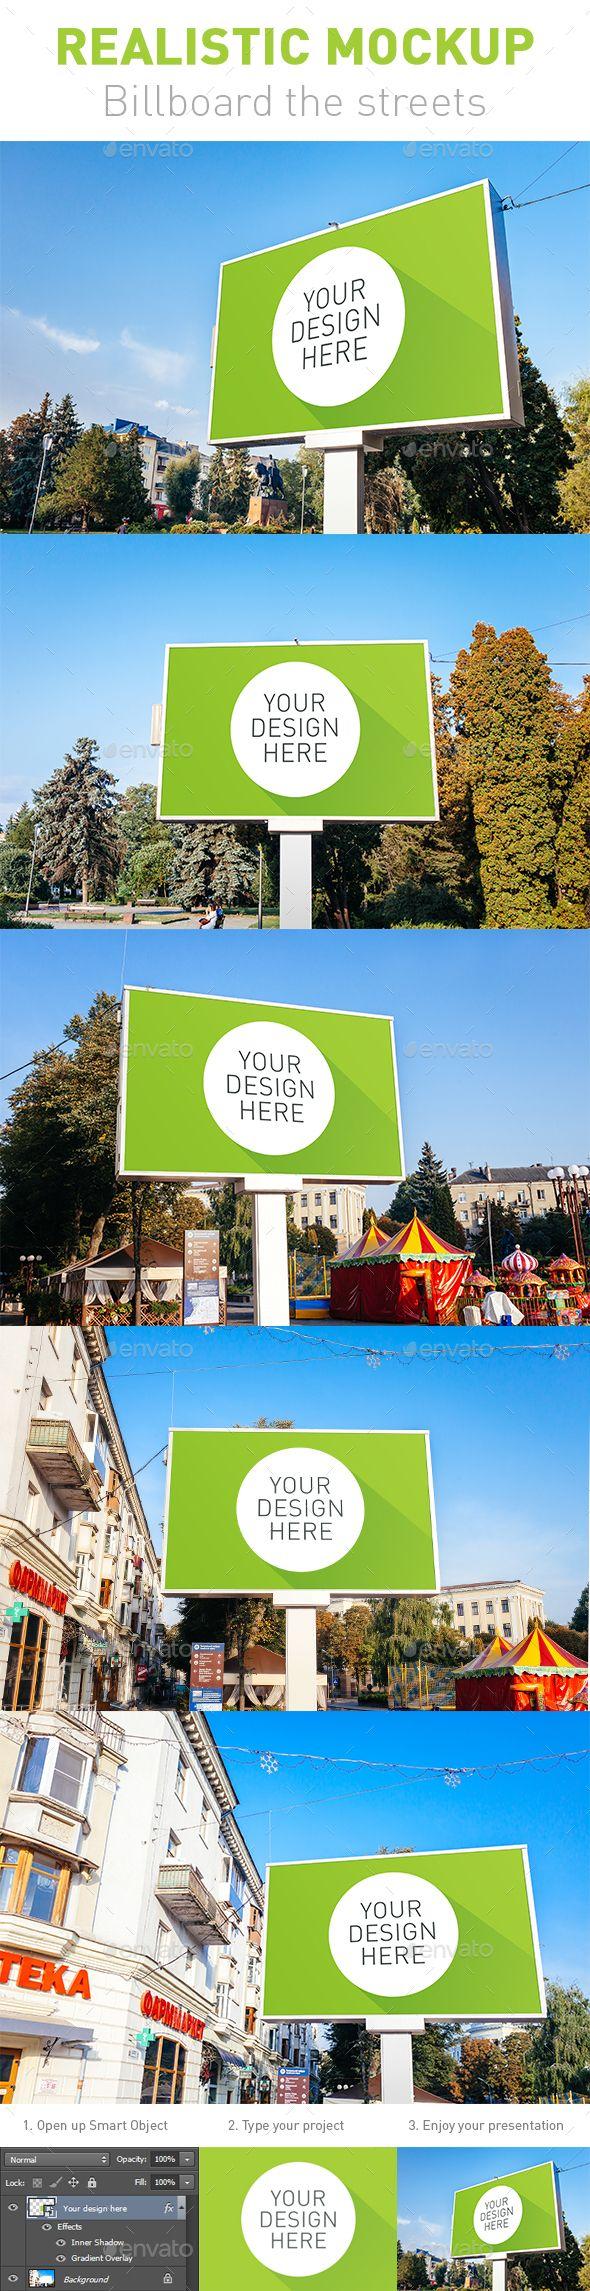 5 Realistic Mockup  Billboard the Streets (Stationery)